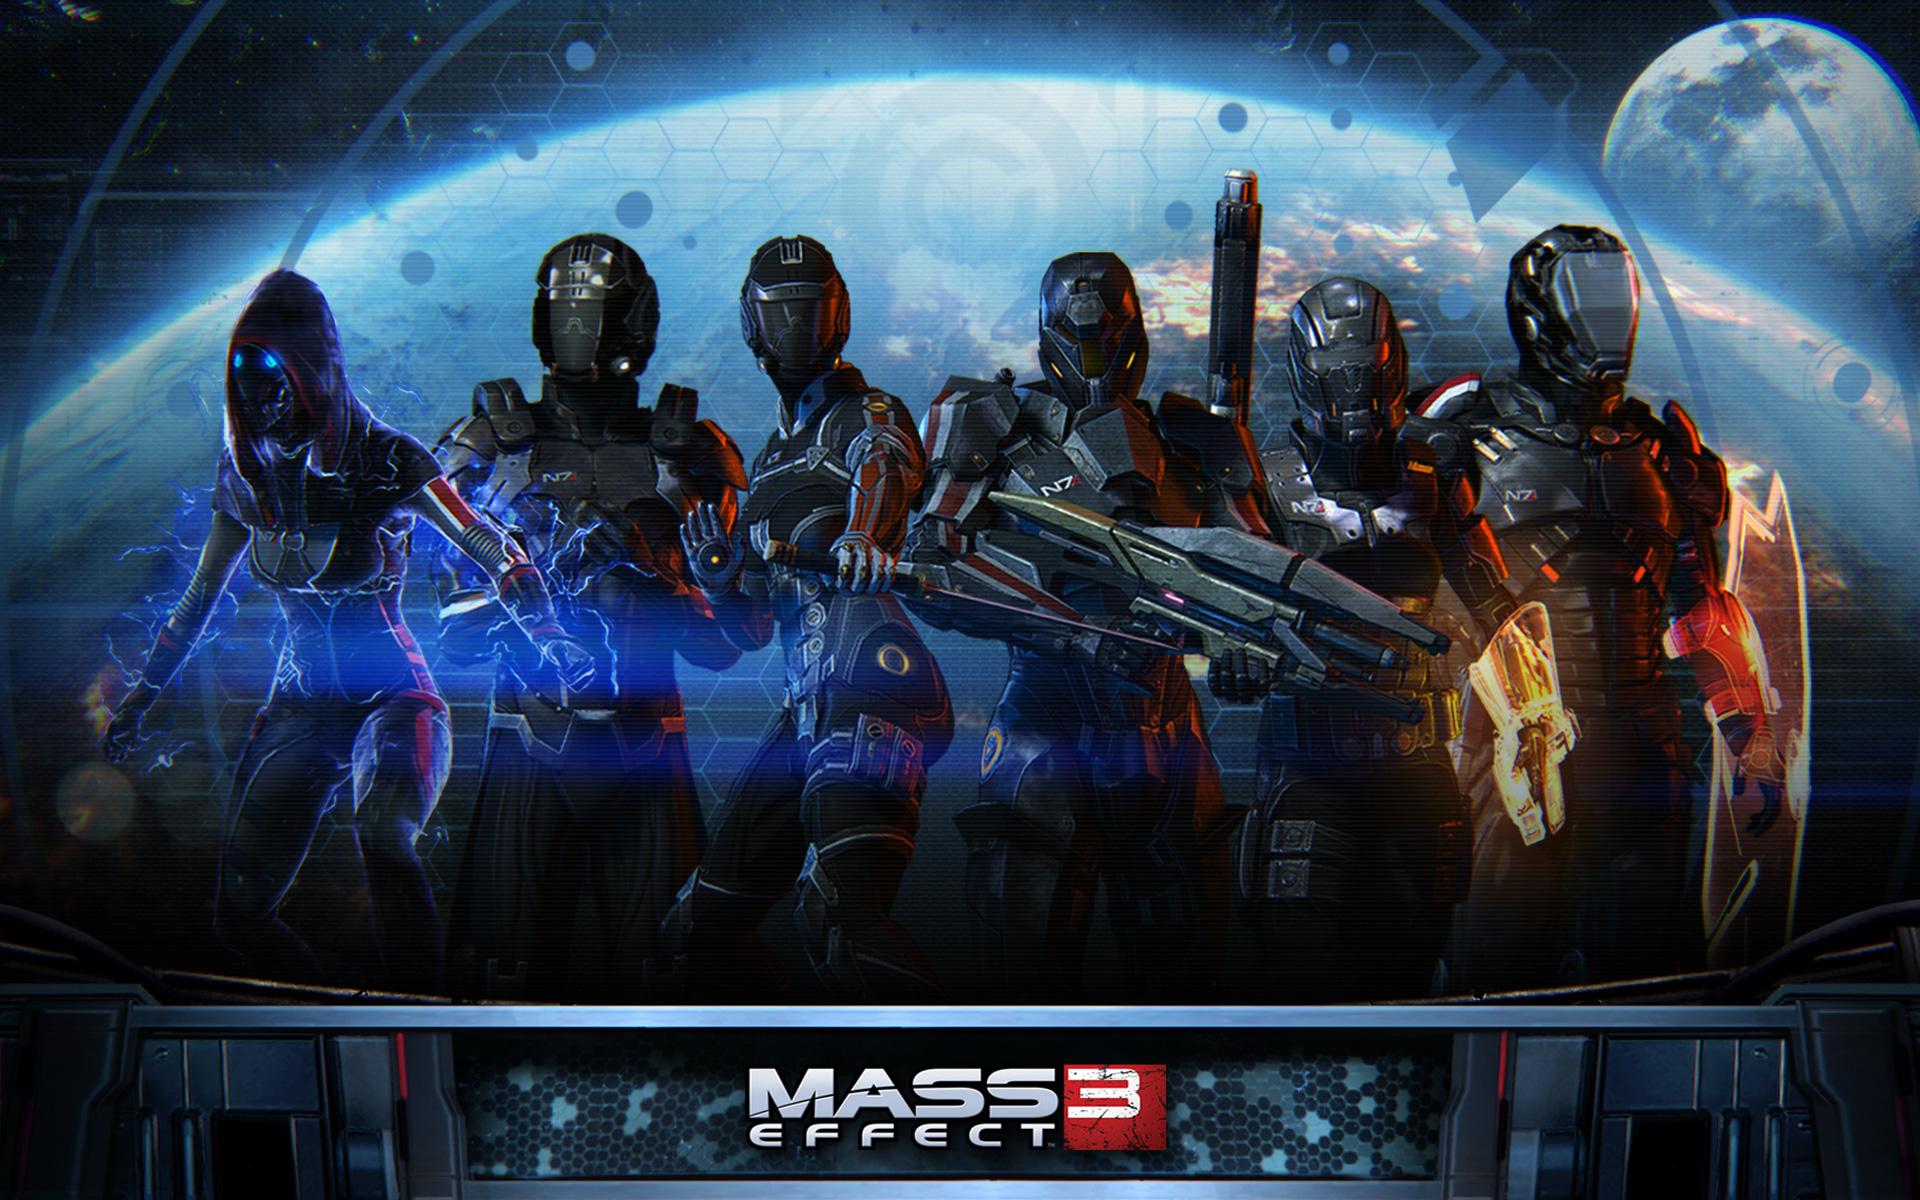 Free Mass Effect 3 Wallpaper in 1920x1200